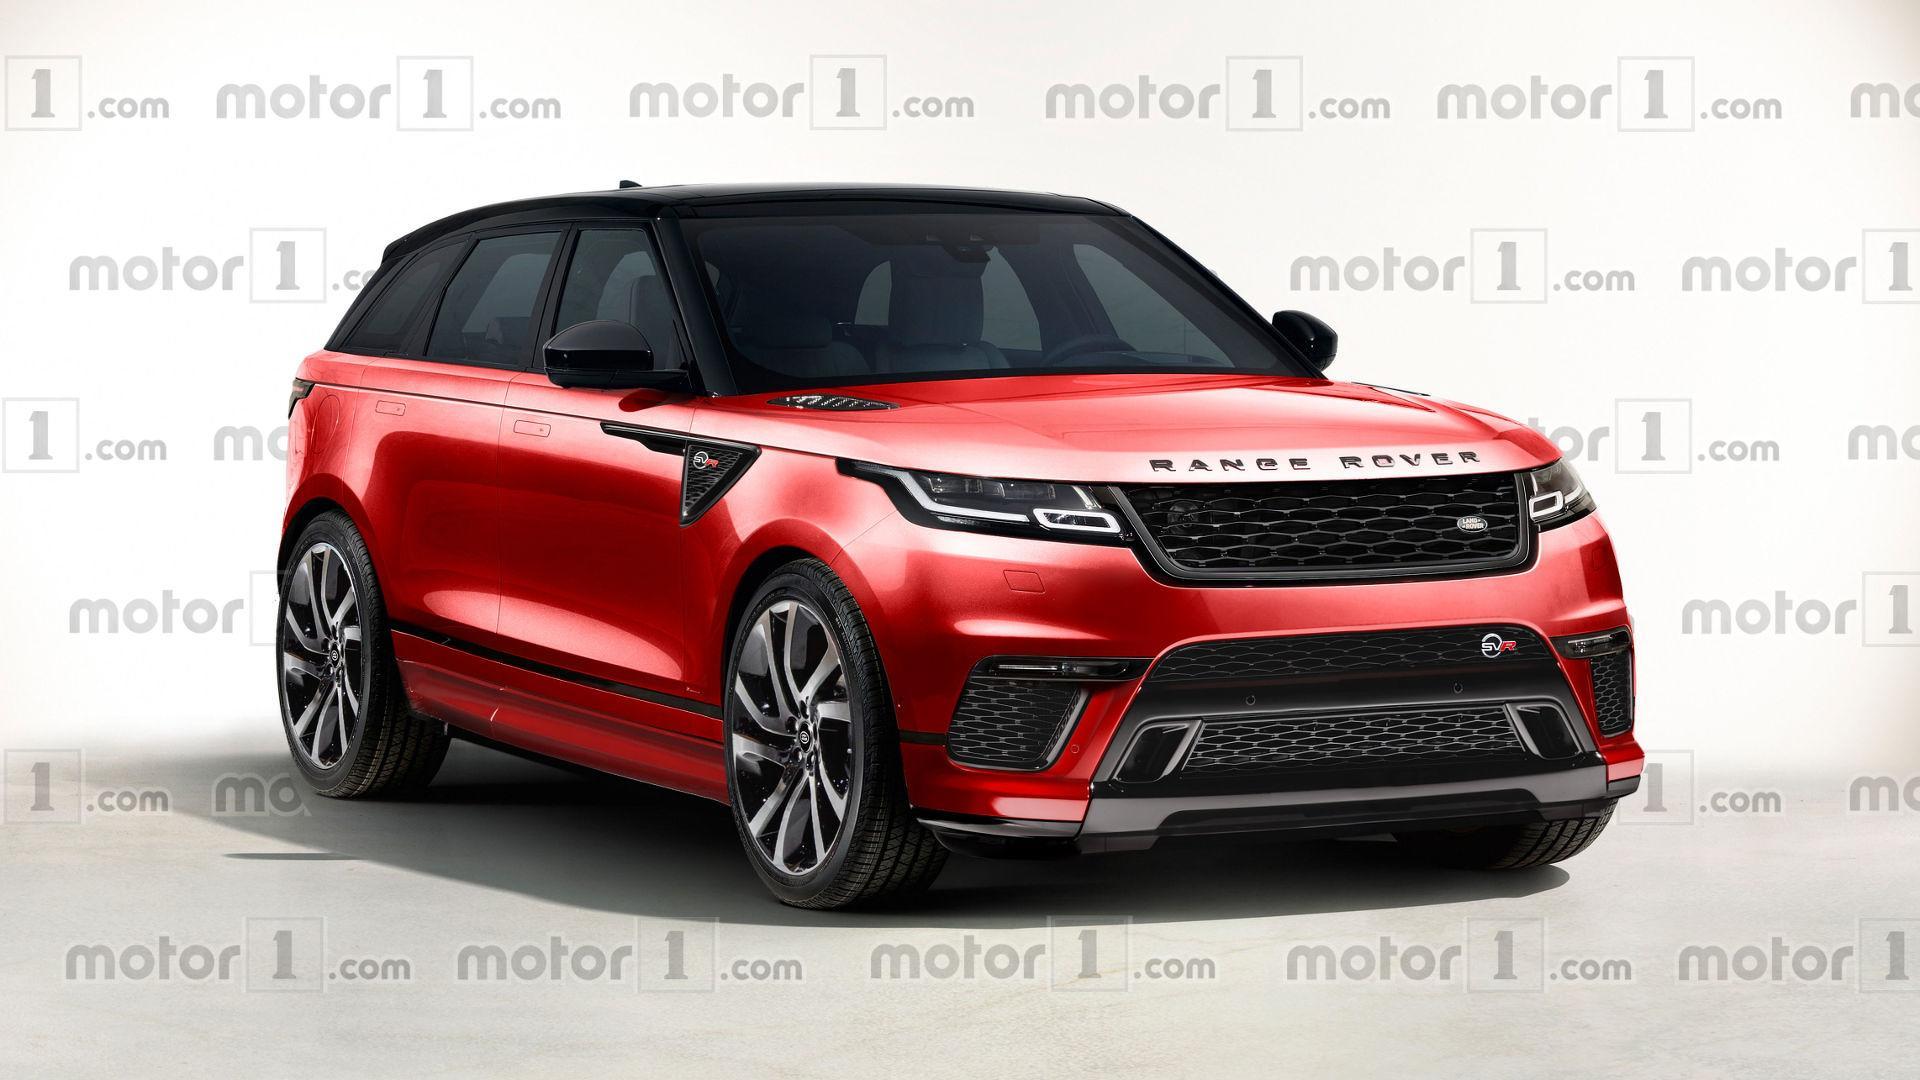 R32 Gtr For Sale Philippines >> 100+ [ Velar Land Rover ] | Land Rover Represents Range Rover Velar East Autos Ltd News,2018 ...